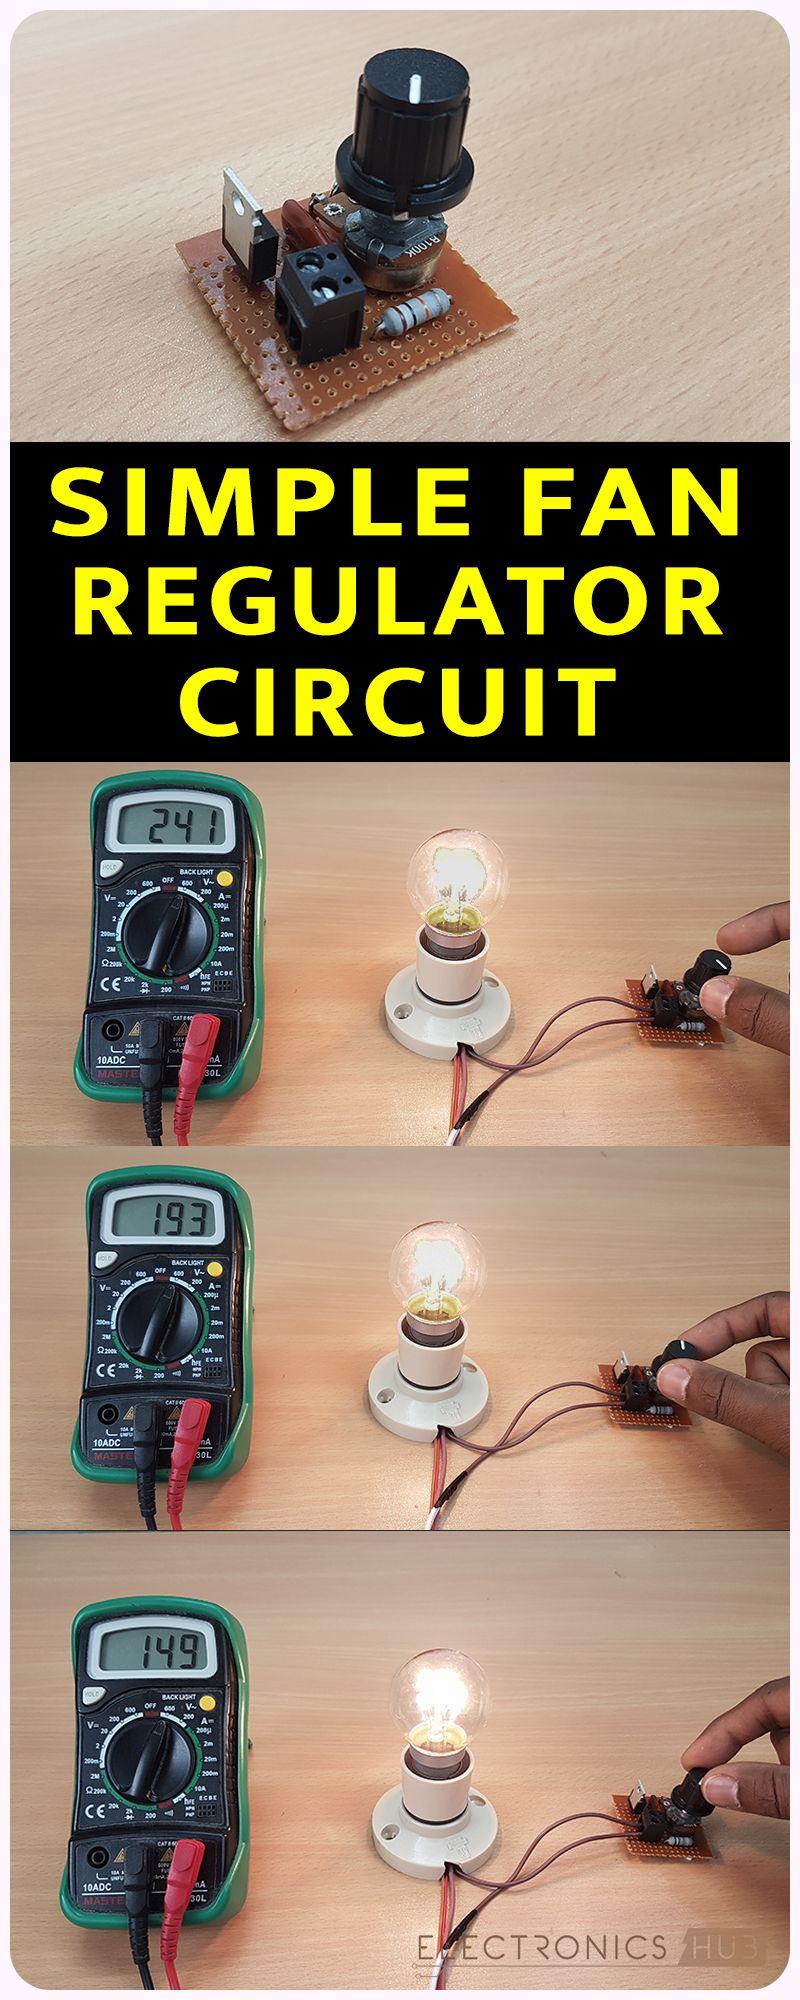 Simple Fan Regulator Circuit Using Triac And Diac Electronics Diagrams Of Projects Pinterest Arduino Circuits